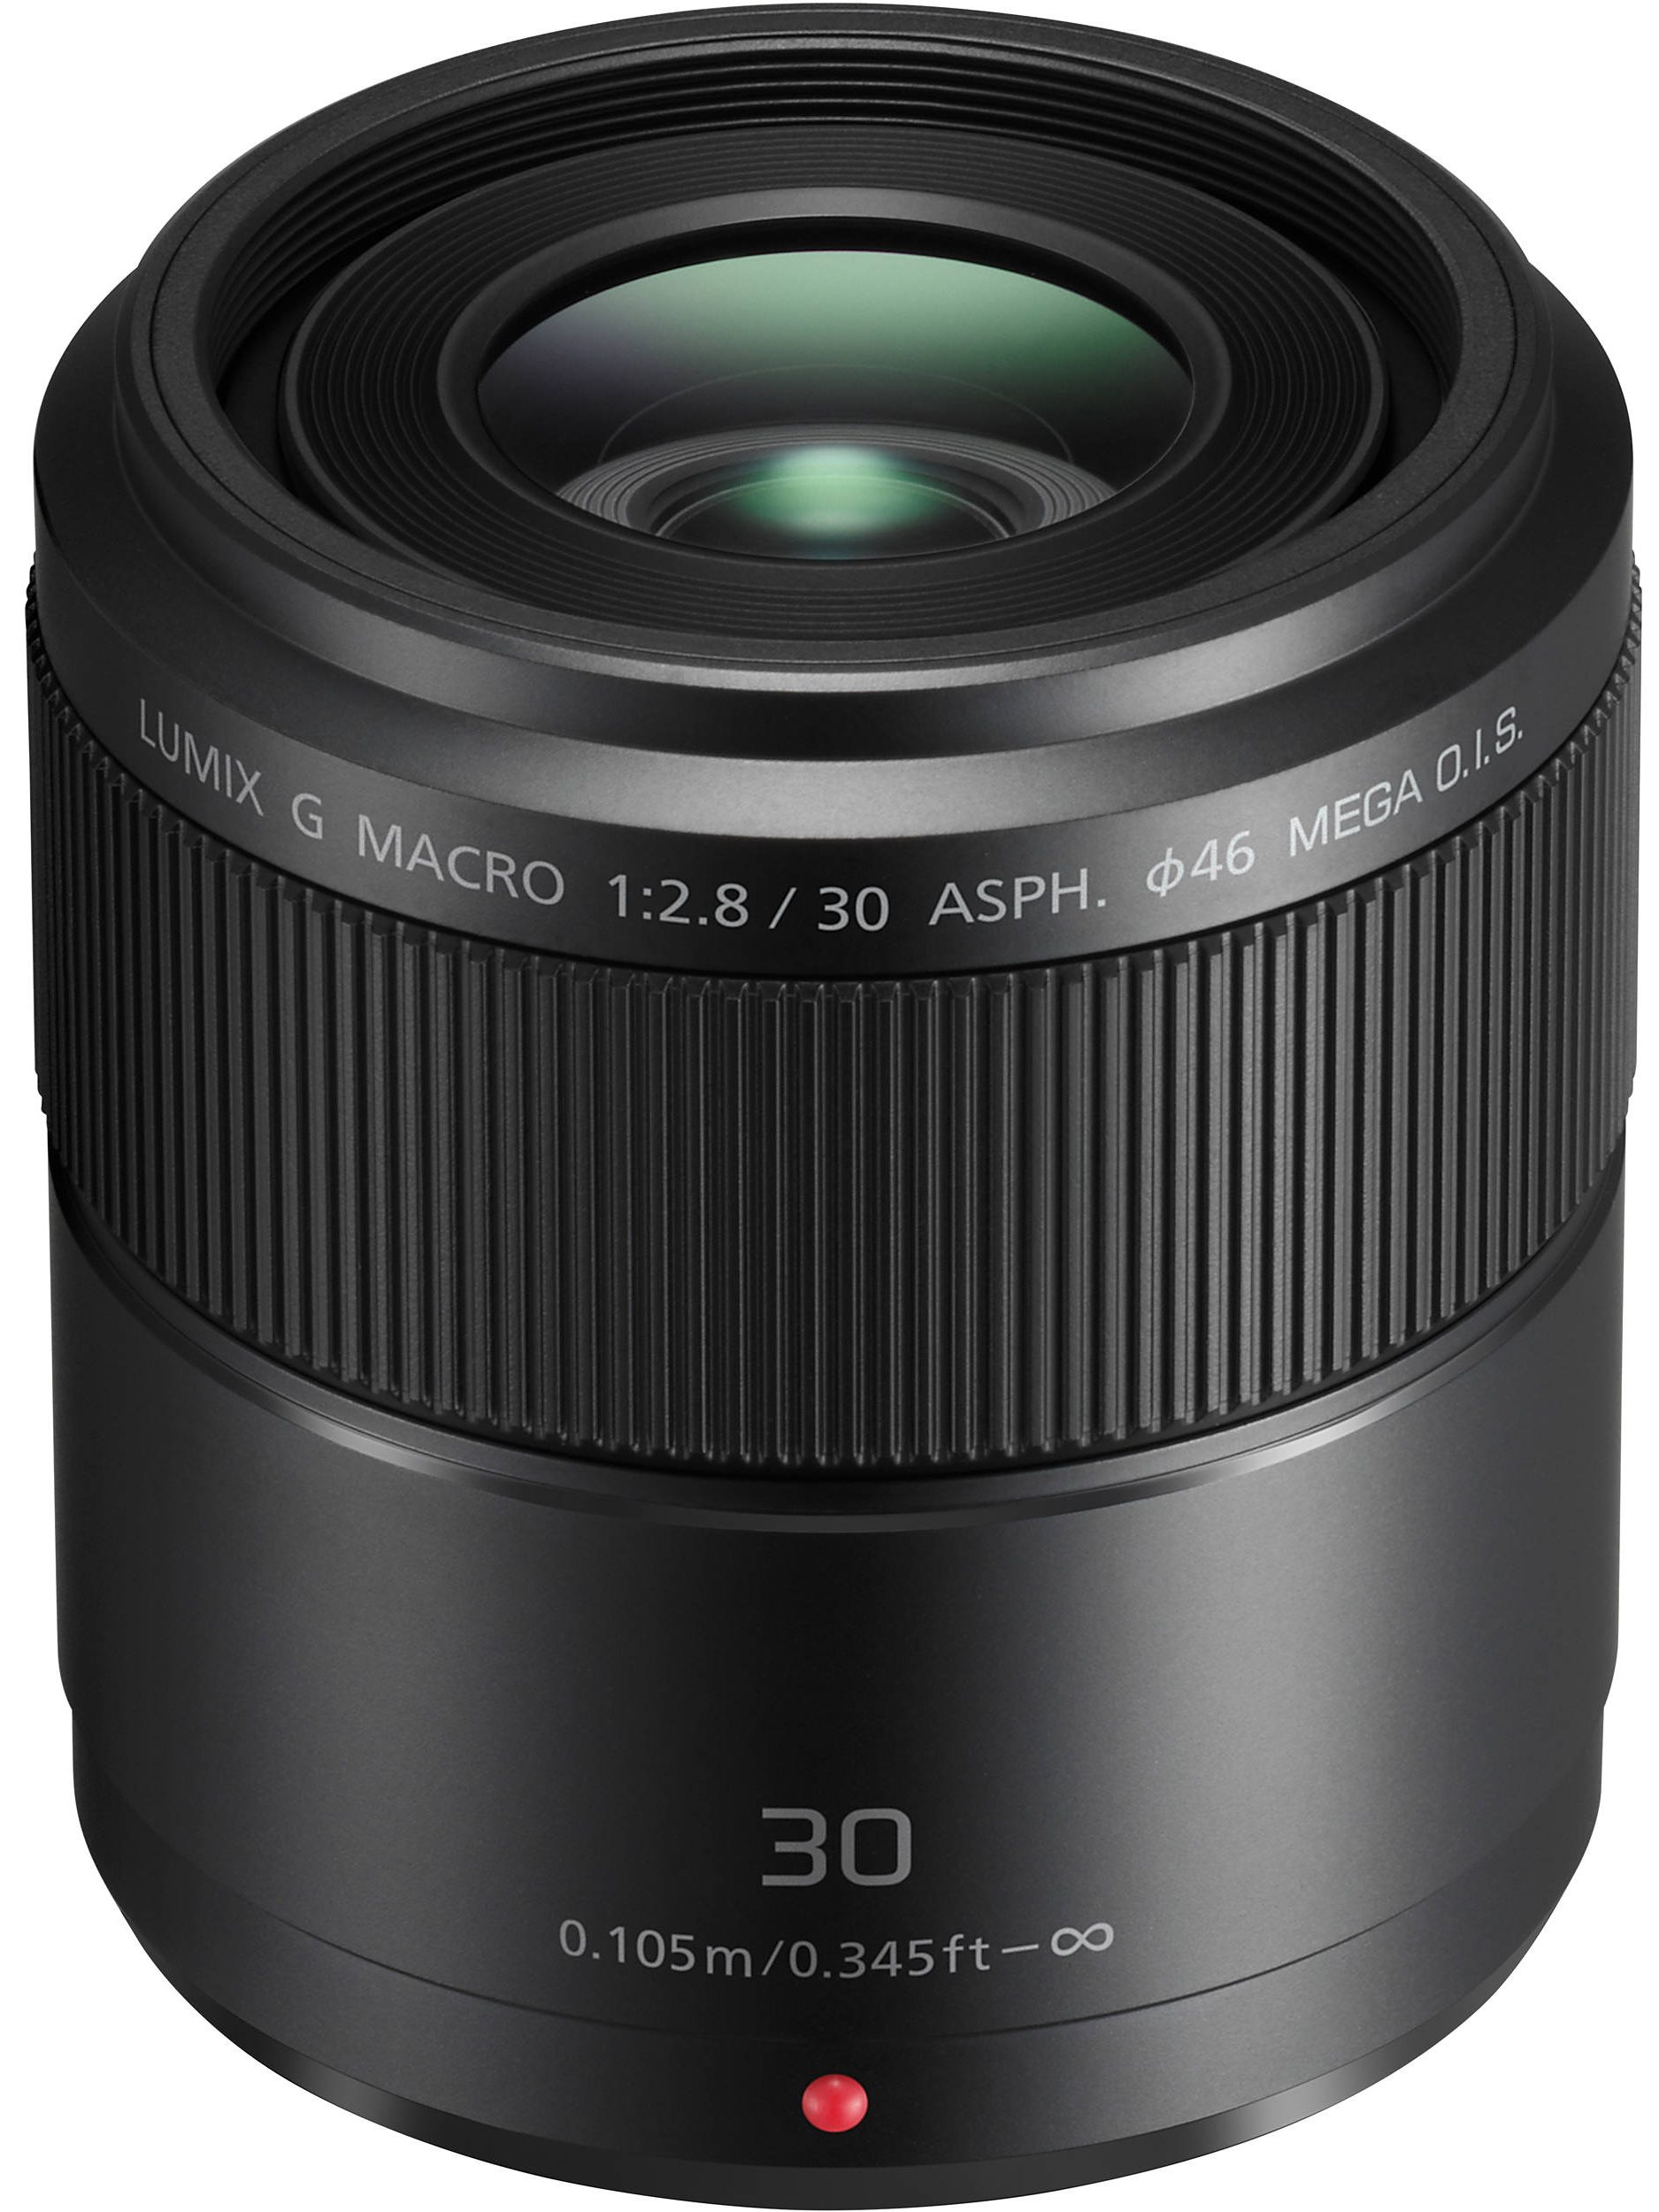 Panasonic Lumix G Macro 30mm f/2.8 ASPH Mega OIS